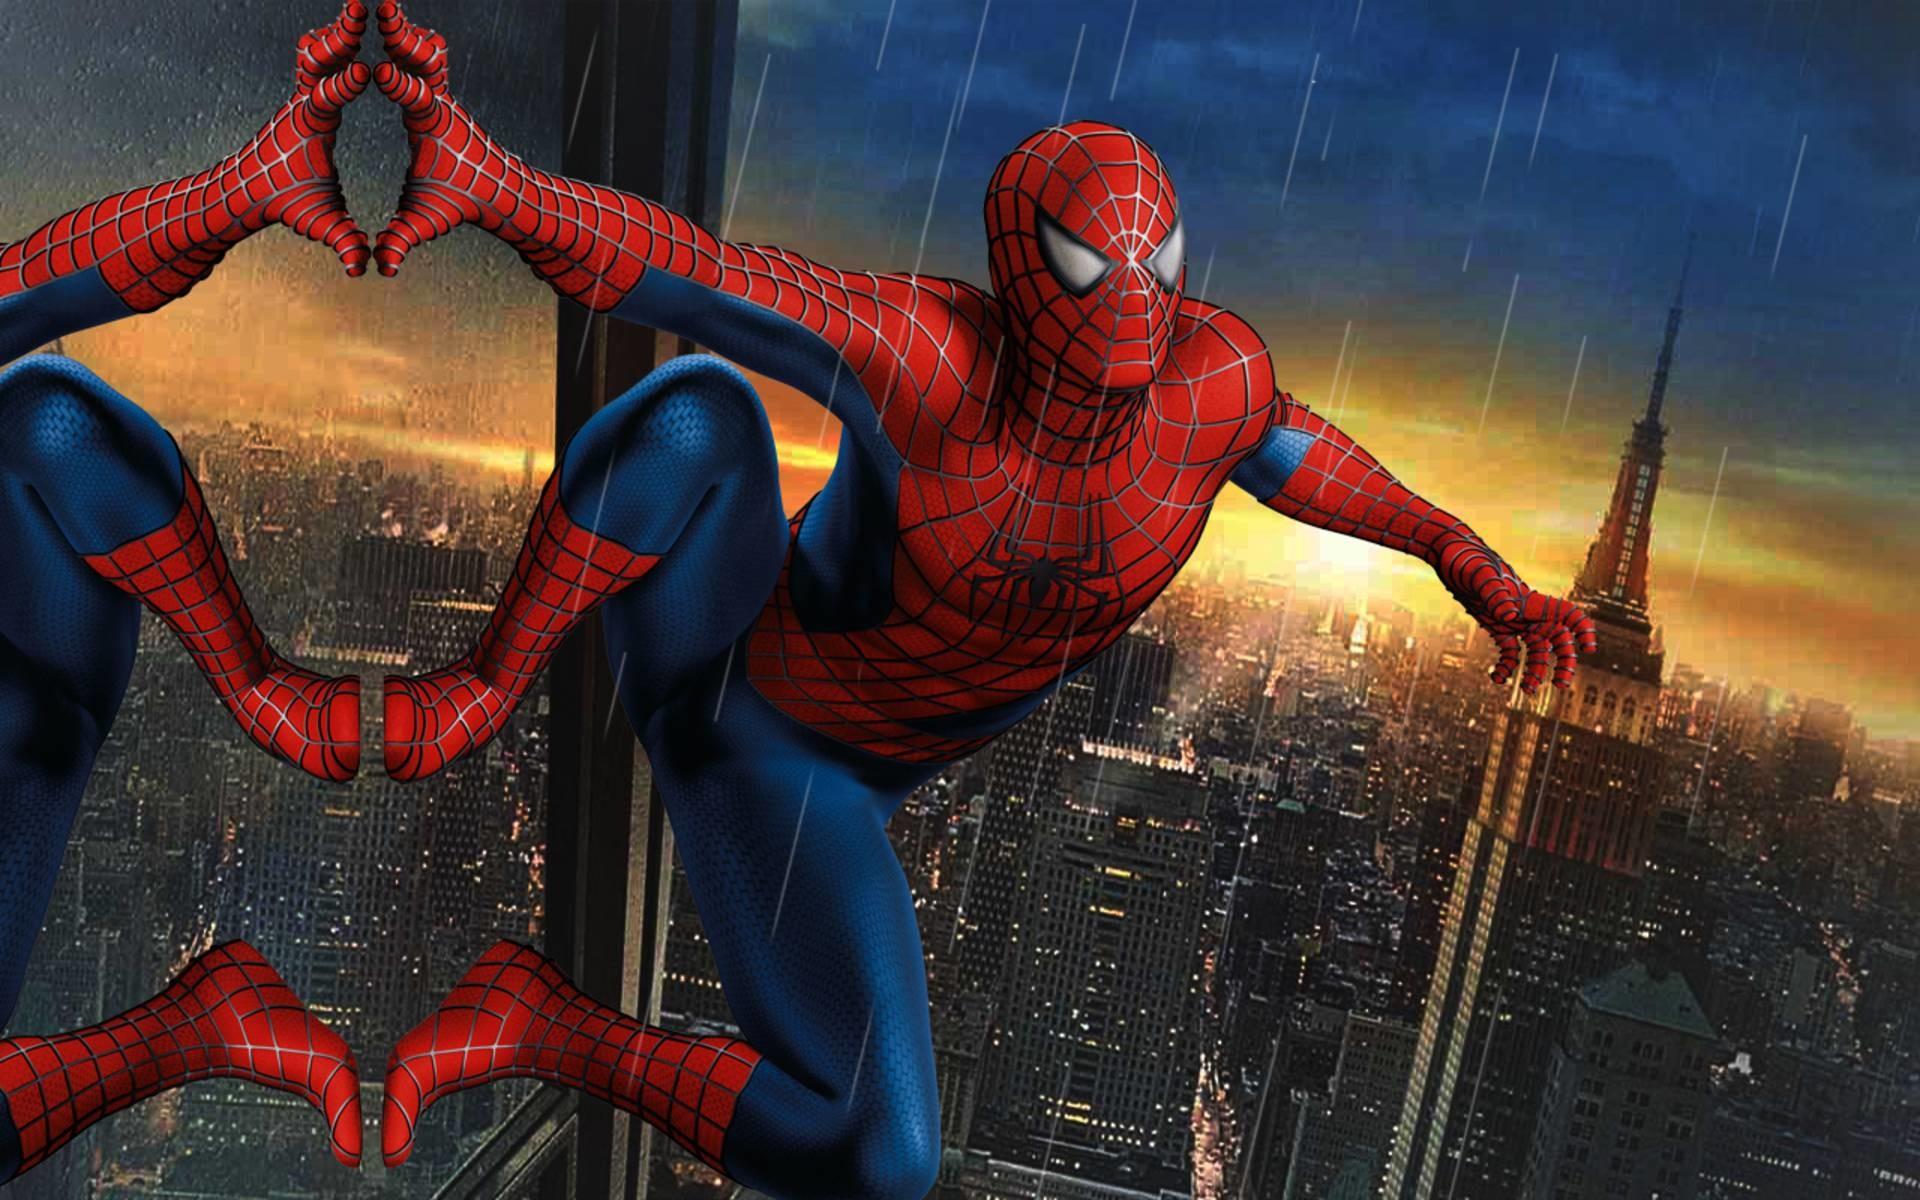 Spiderman hd wallpapers 1920x1200 games spiderman wallpapers hd wallpaper 1200x1920px spiderman voltagebd Gallery